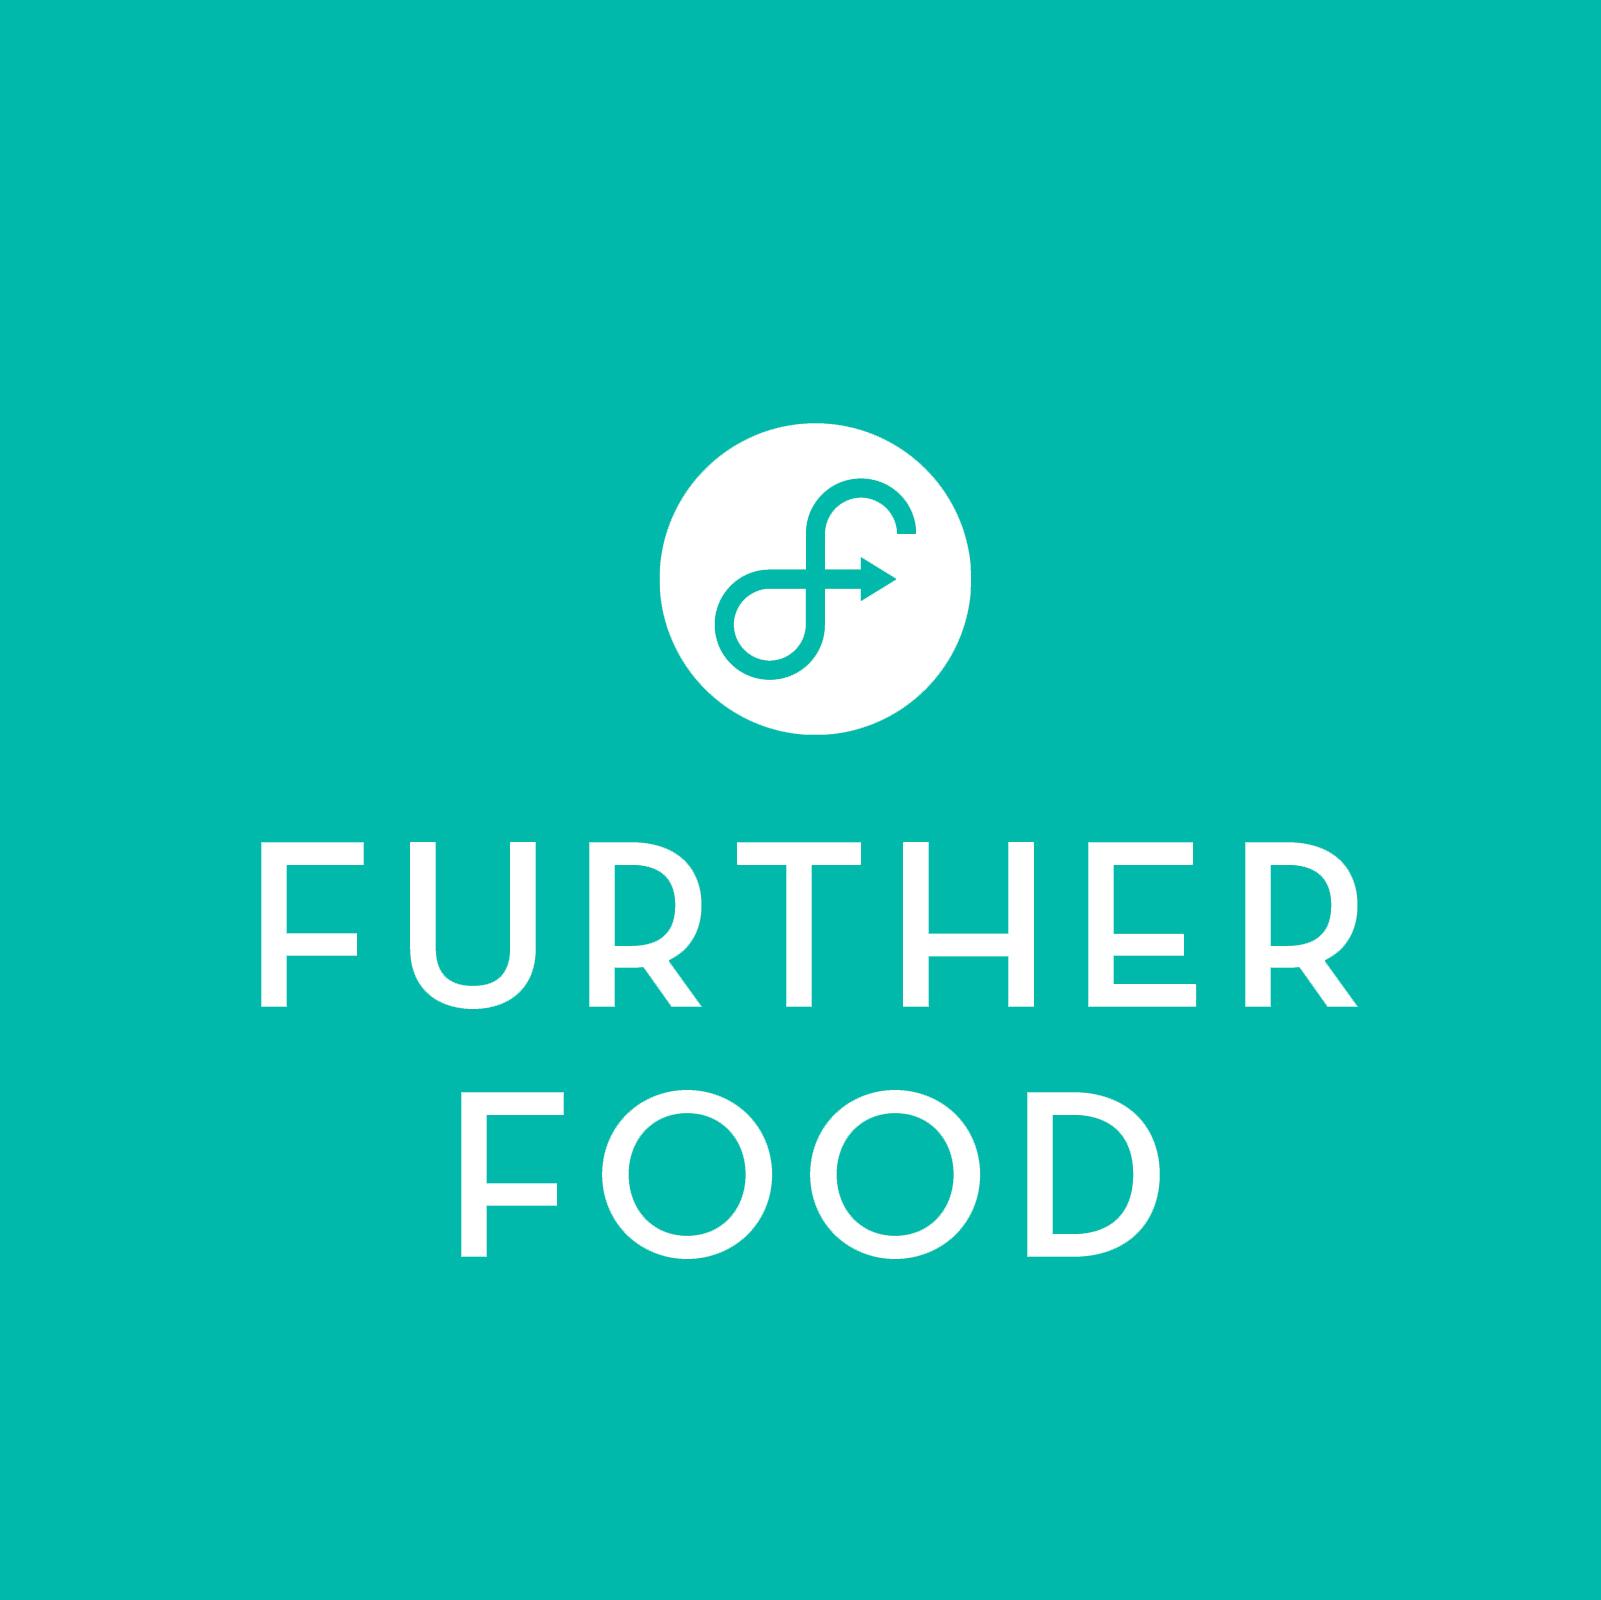 FURTHER FOOD LOGO SQUARE.jpg